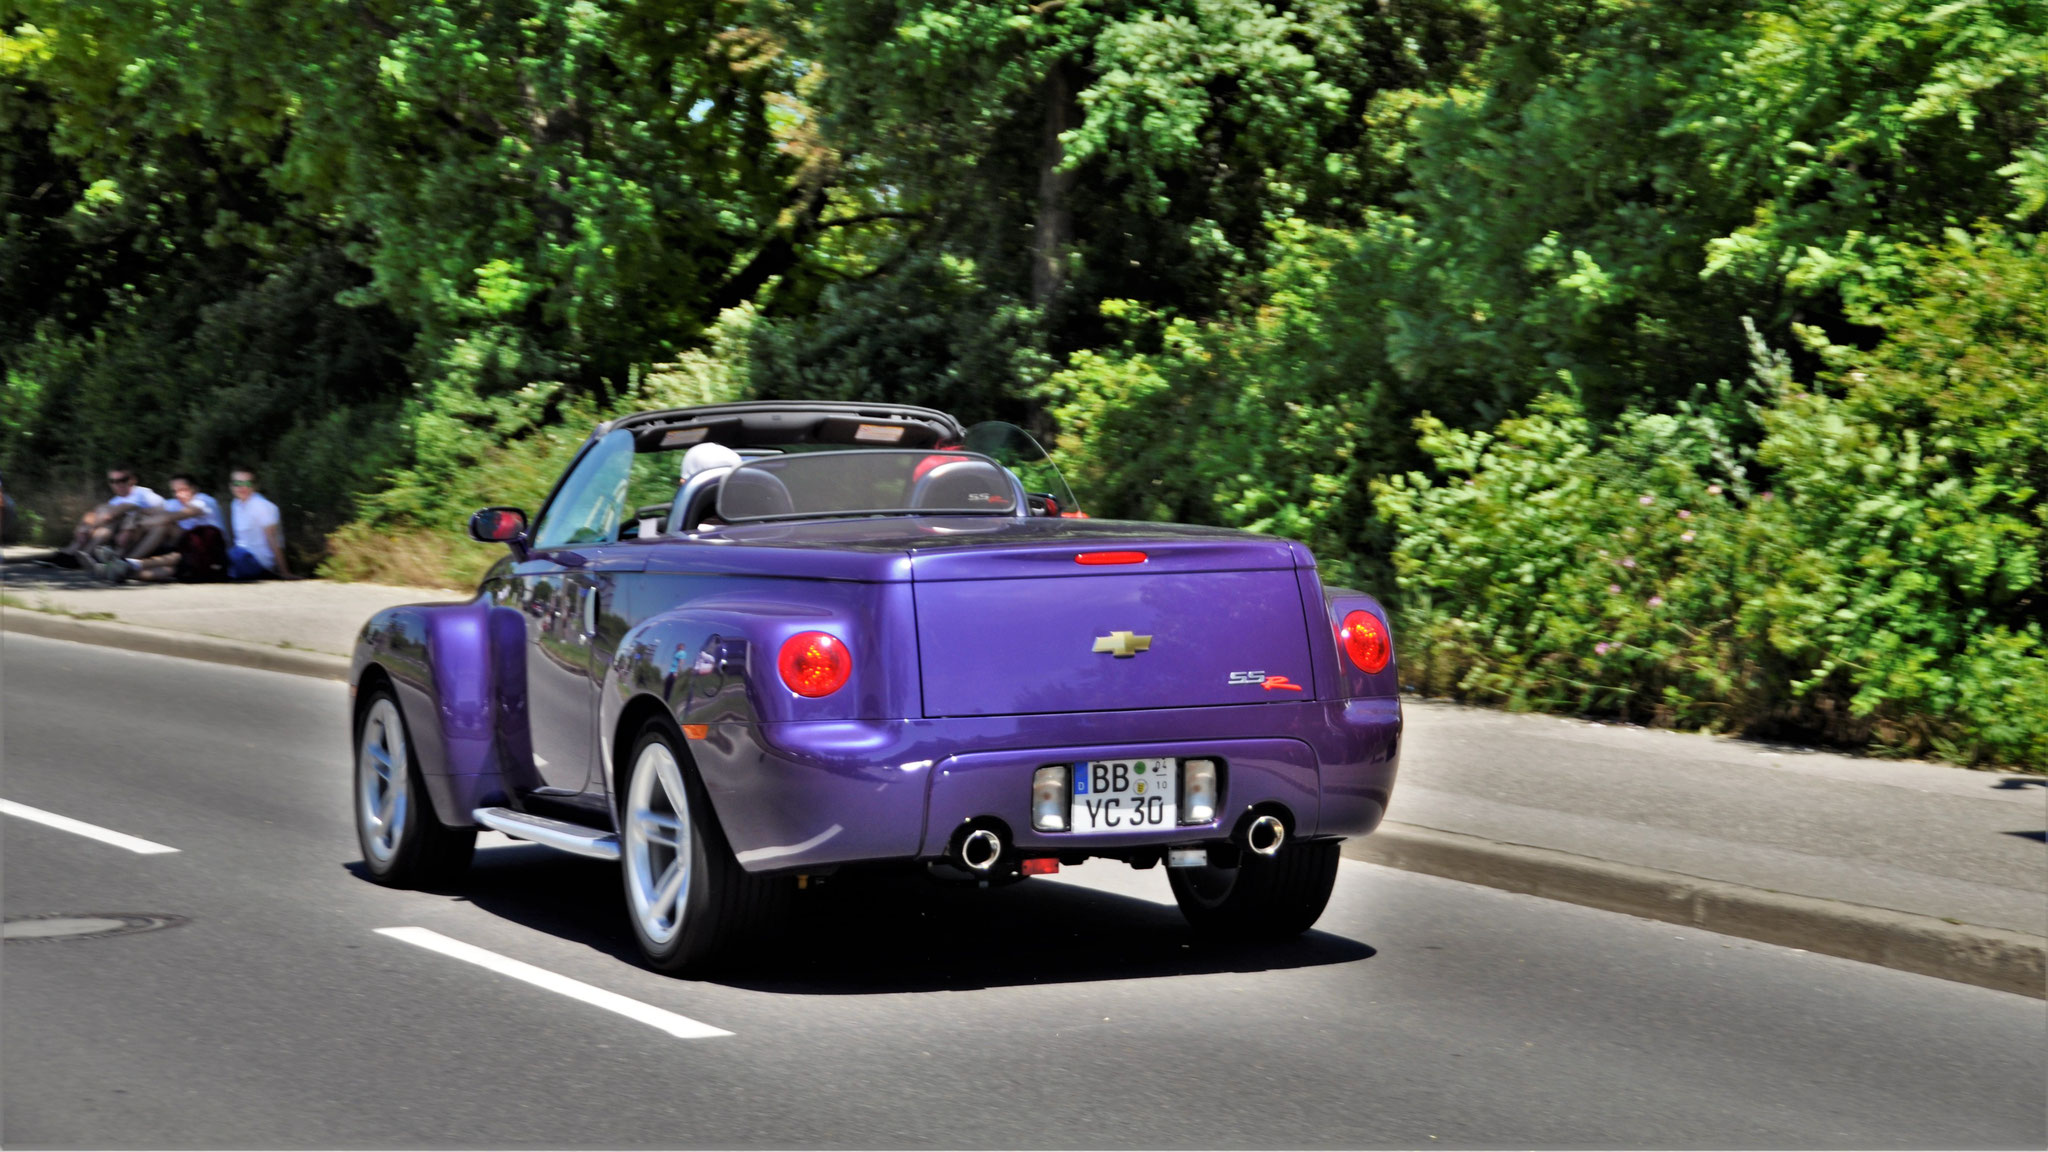 Chevrolet SSR - BB-YC-30